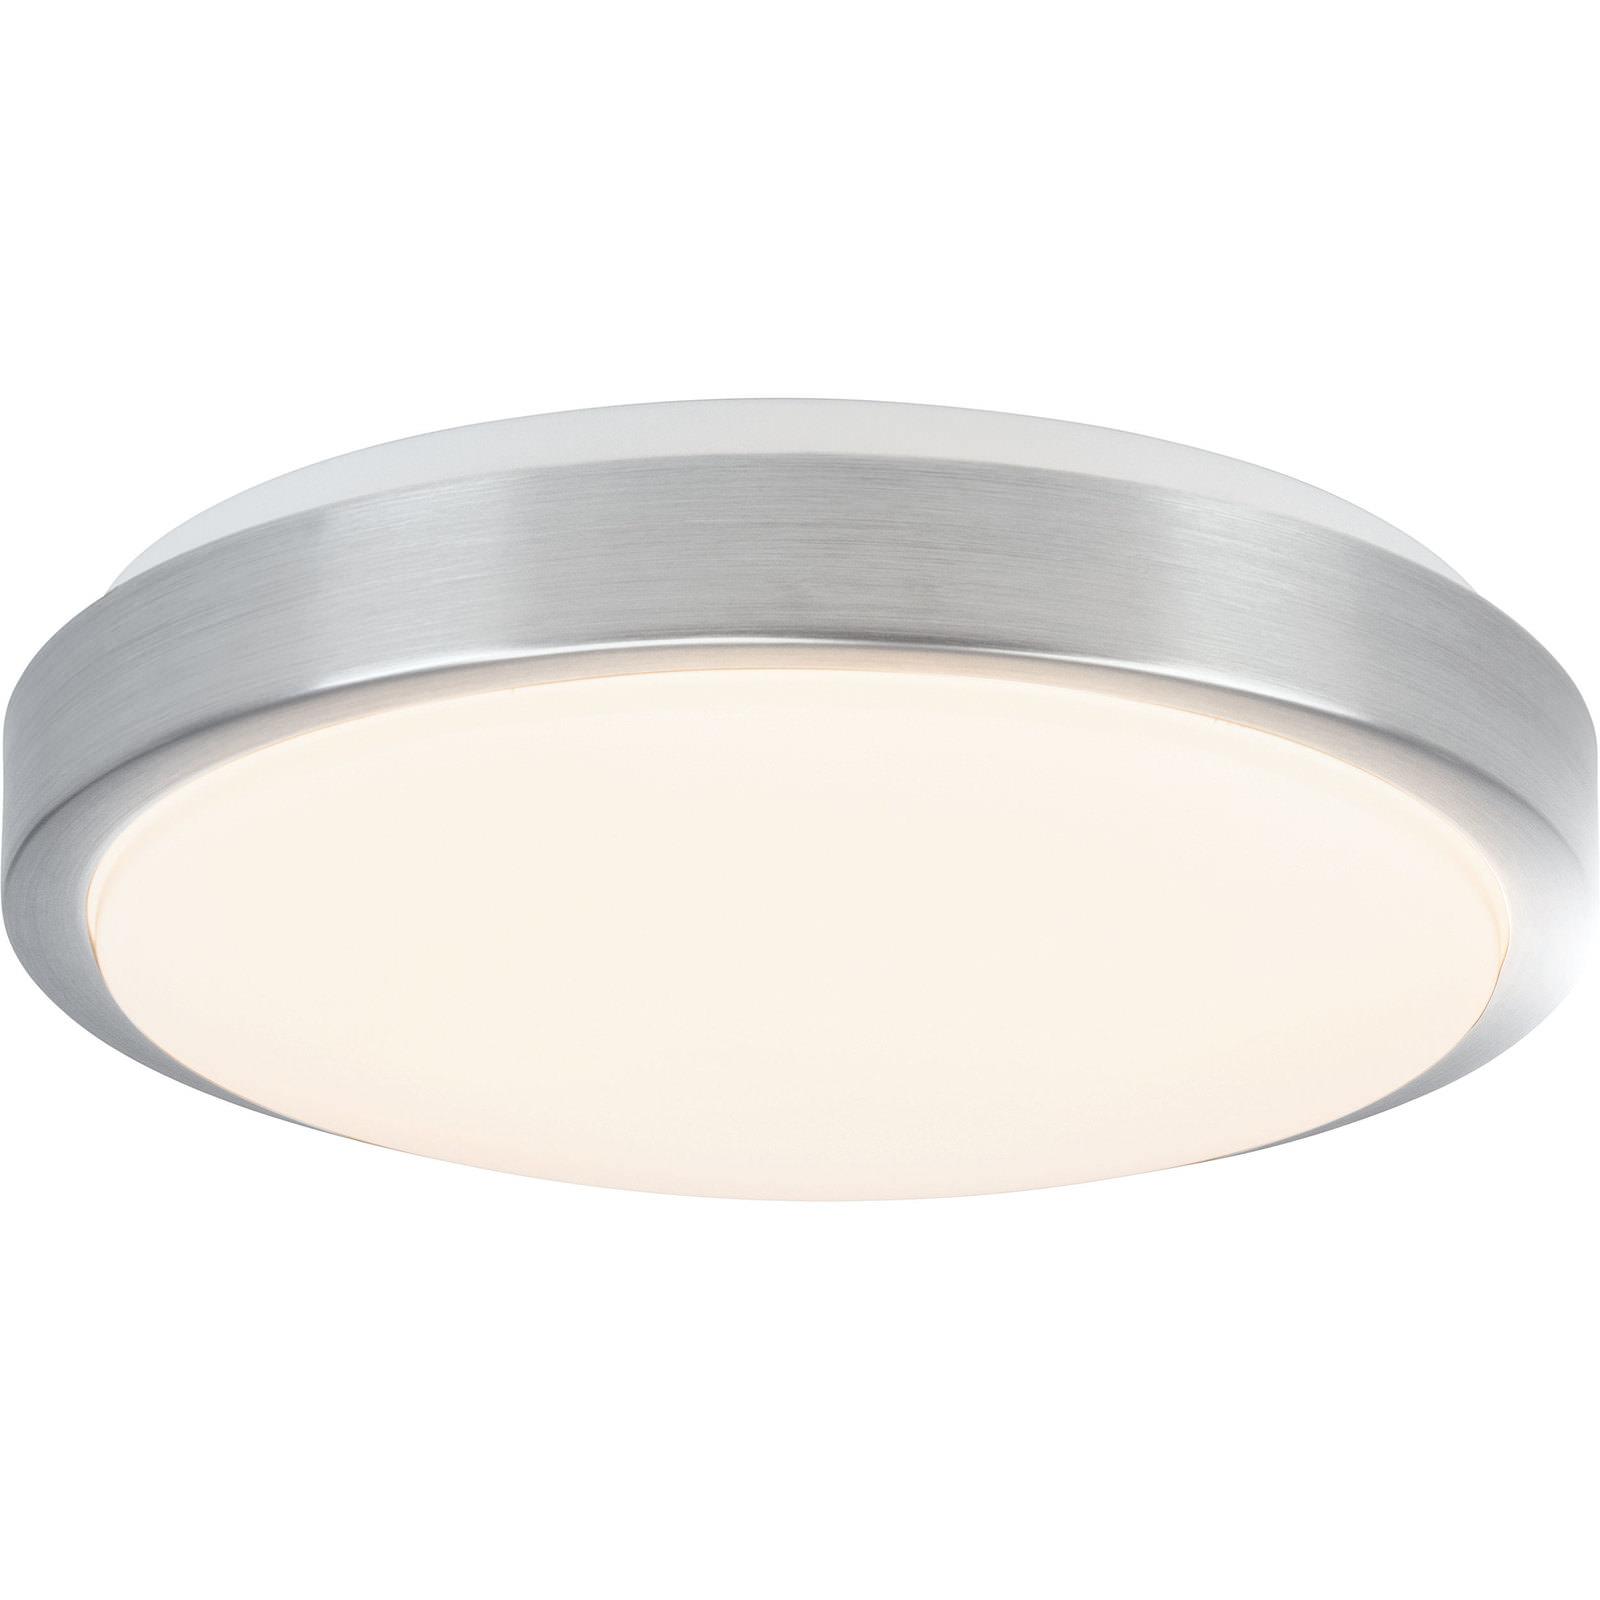 BRELIGHT LED Deckenleuchte 1flg LIVIUS